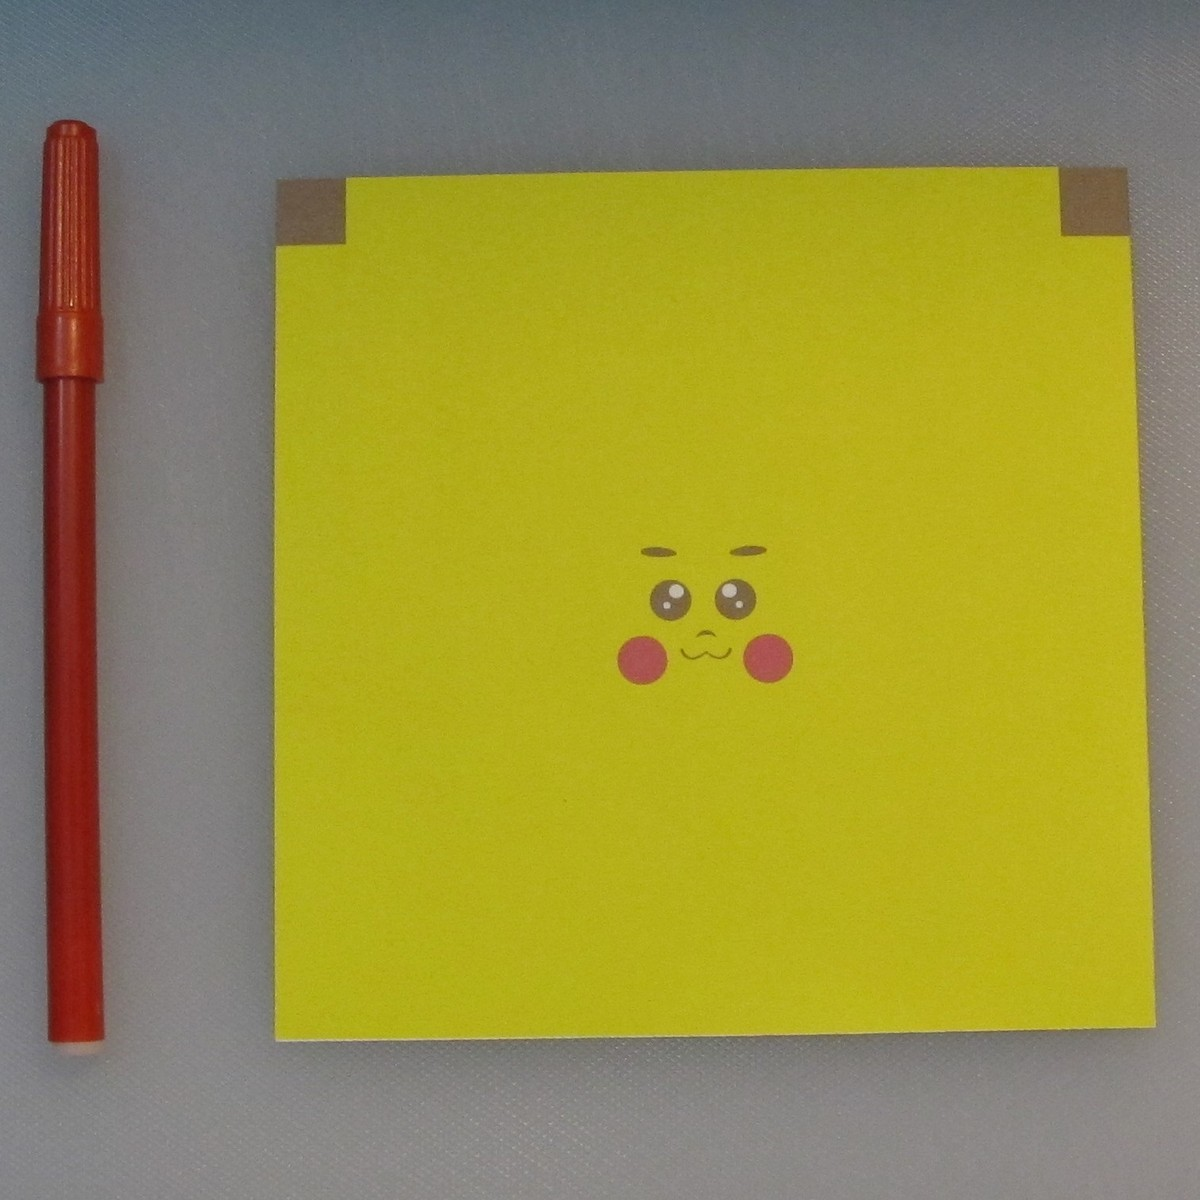 mookeep-วิธีพับกระดาษเป็นรูปปิกาจู-01-001